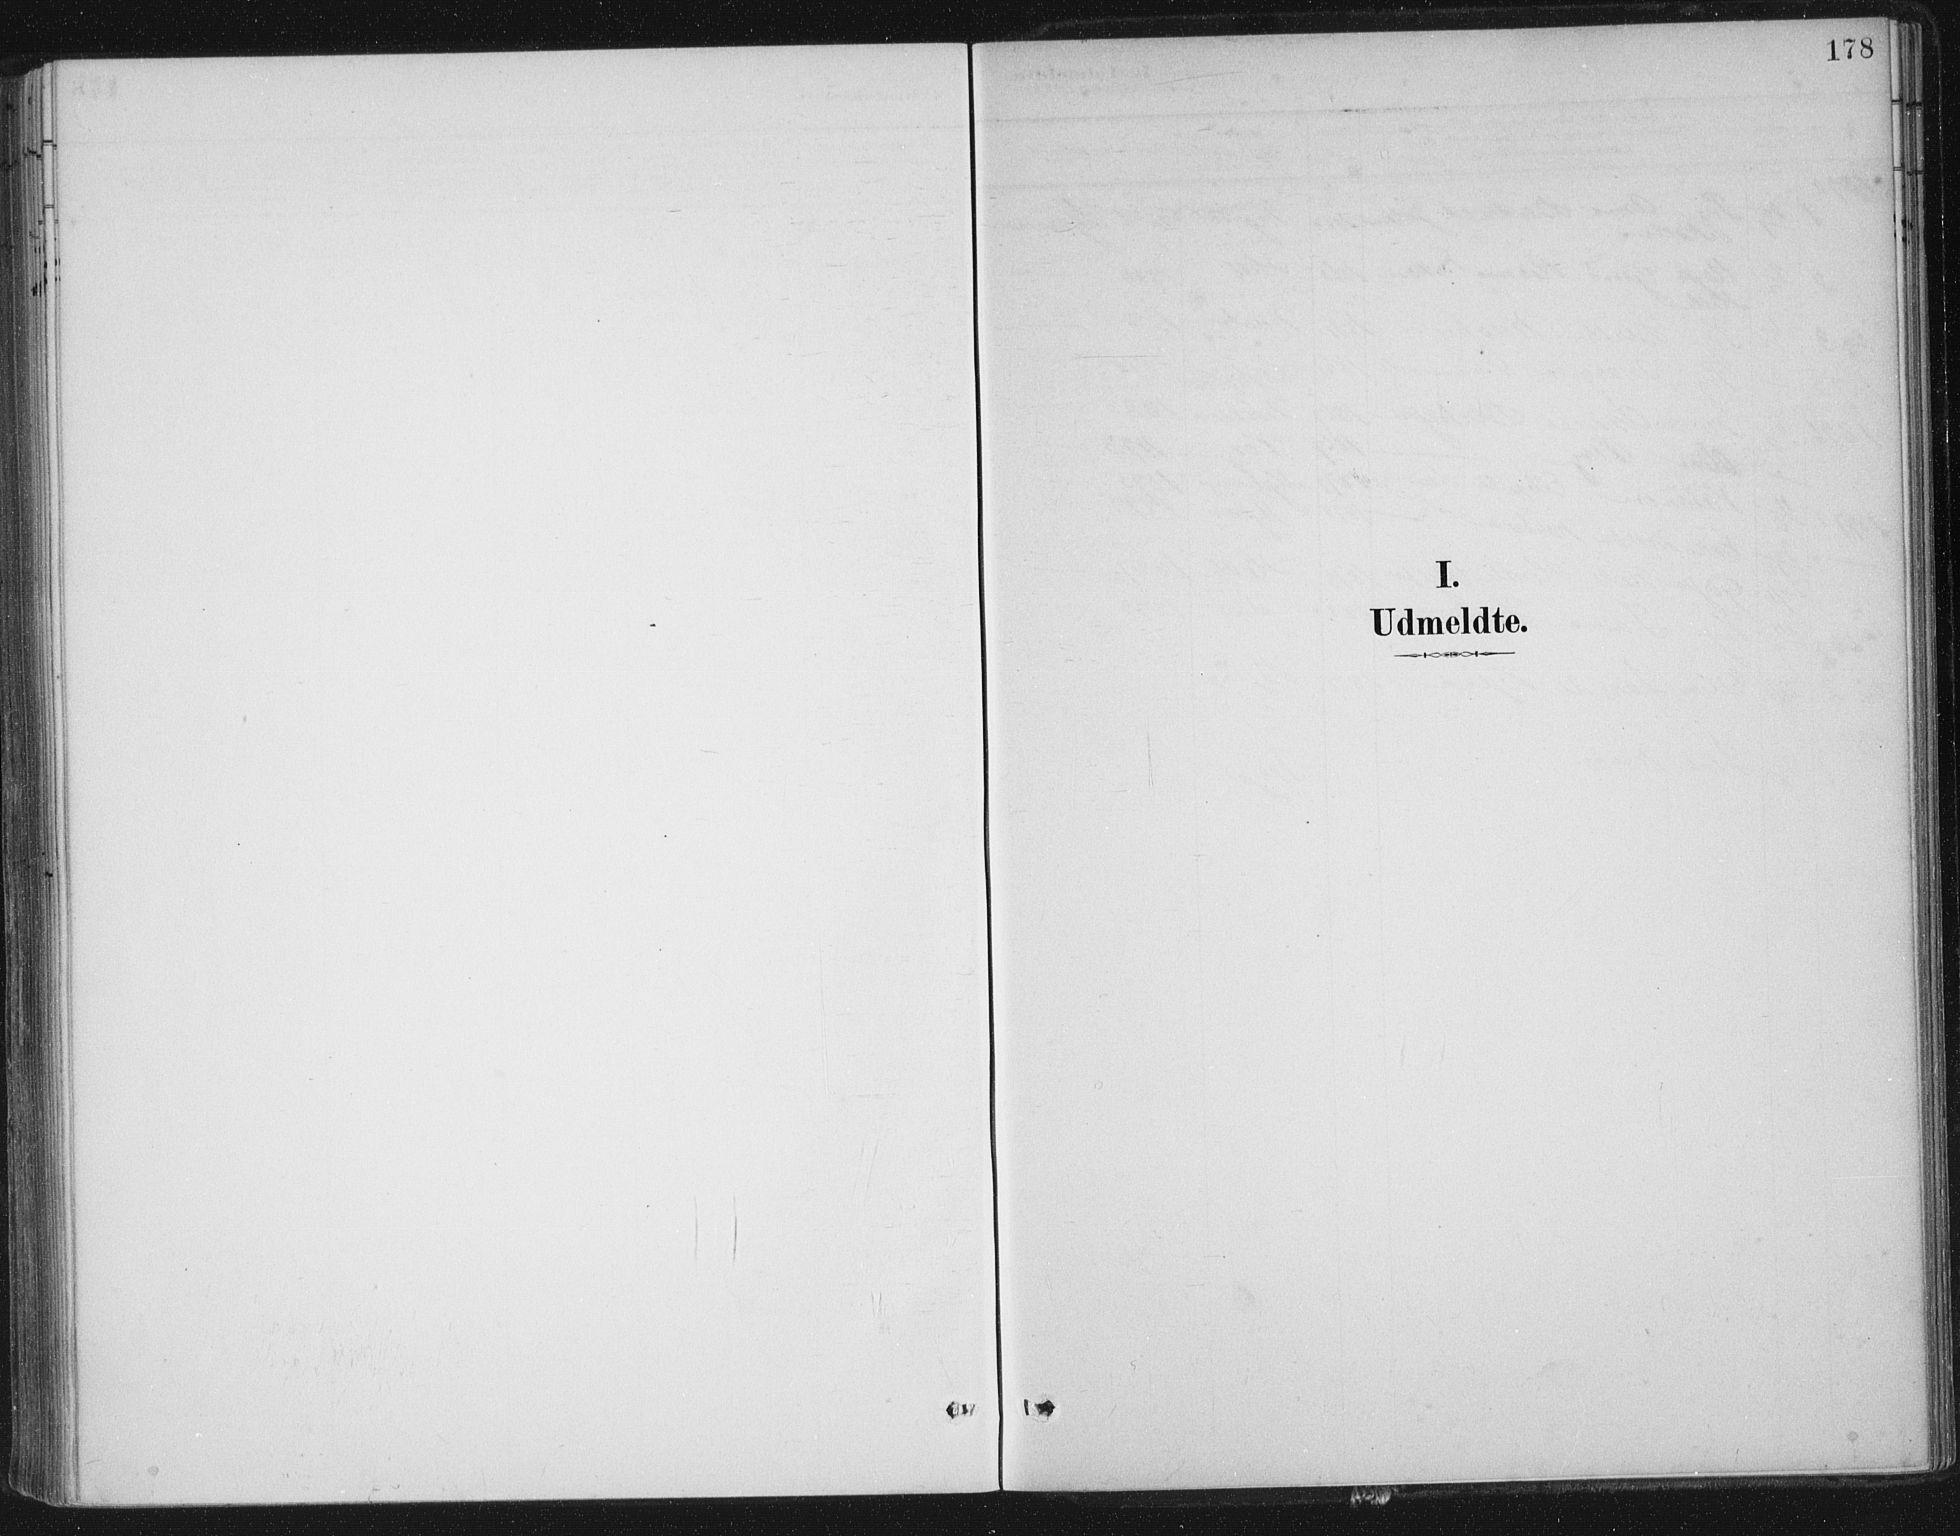 SAST, Nedstrand sokneprestkontor, IV: Ministerialbok nr. A 13, 1887-1915, s. 178